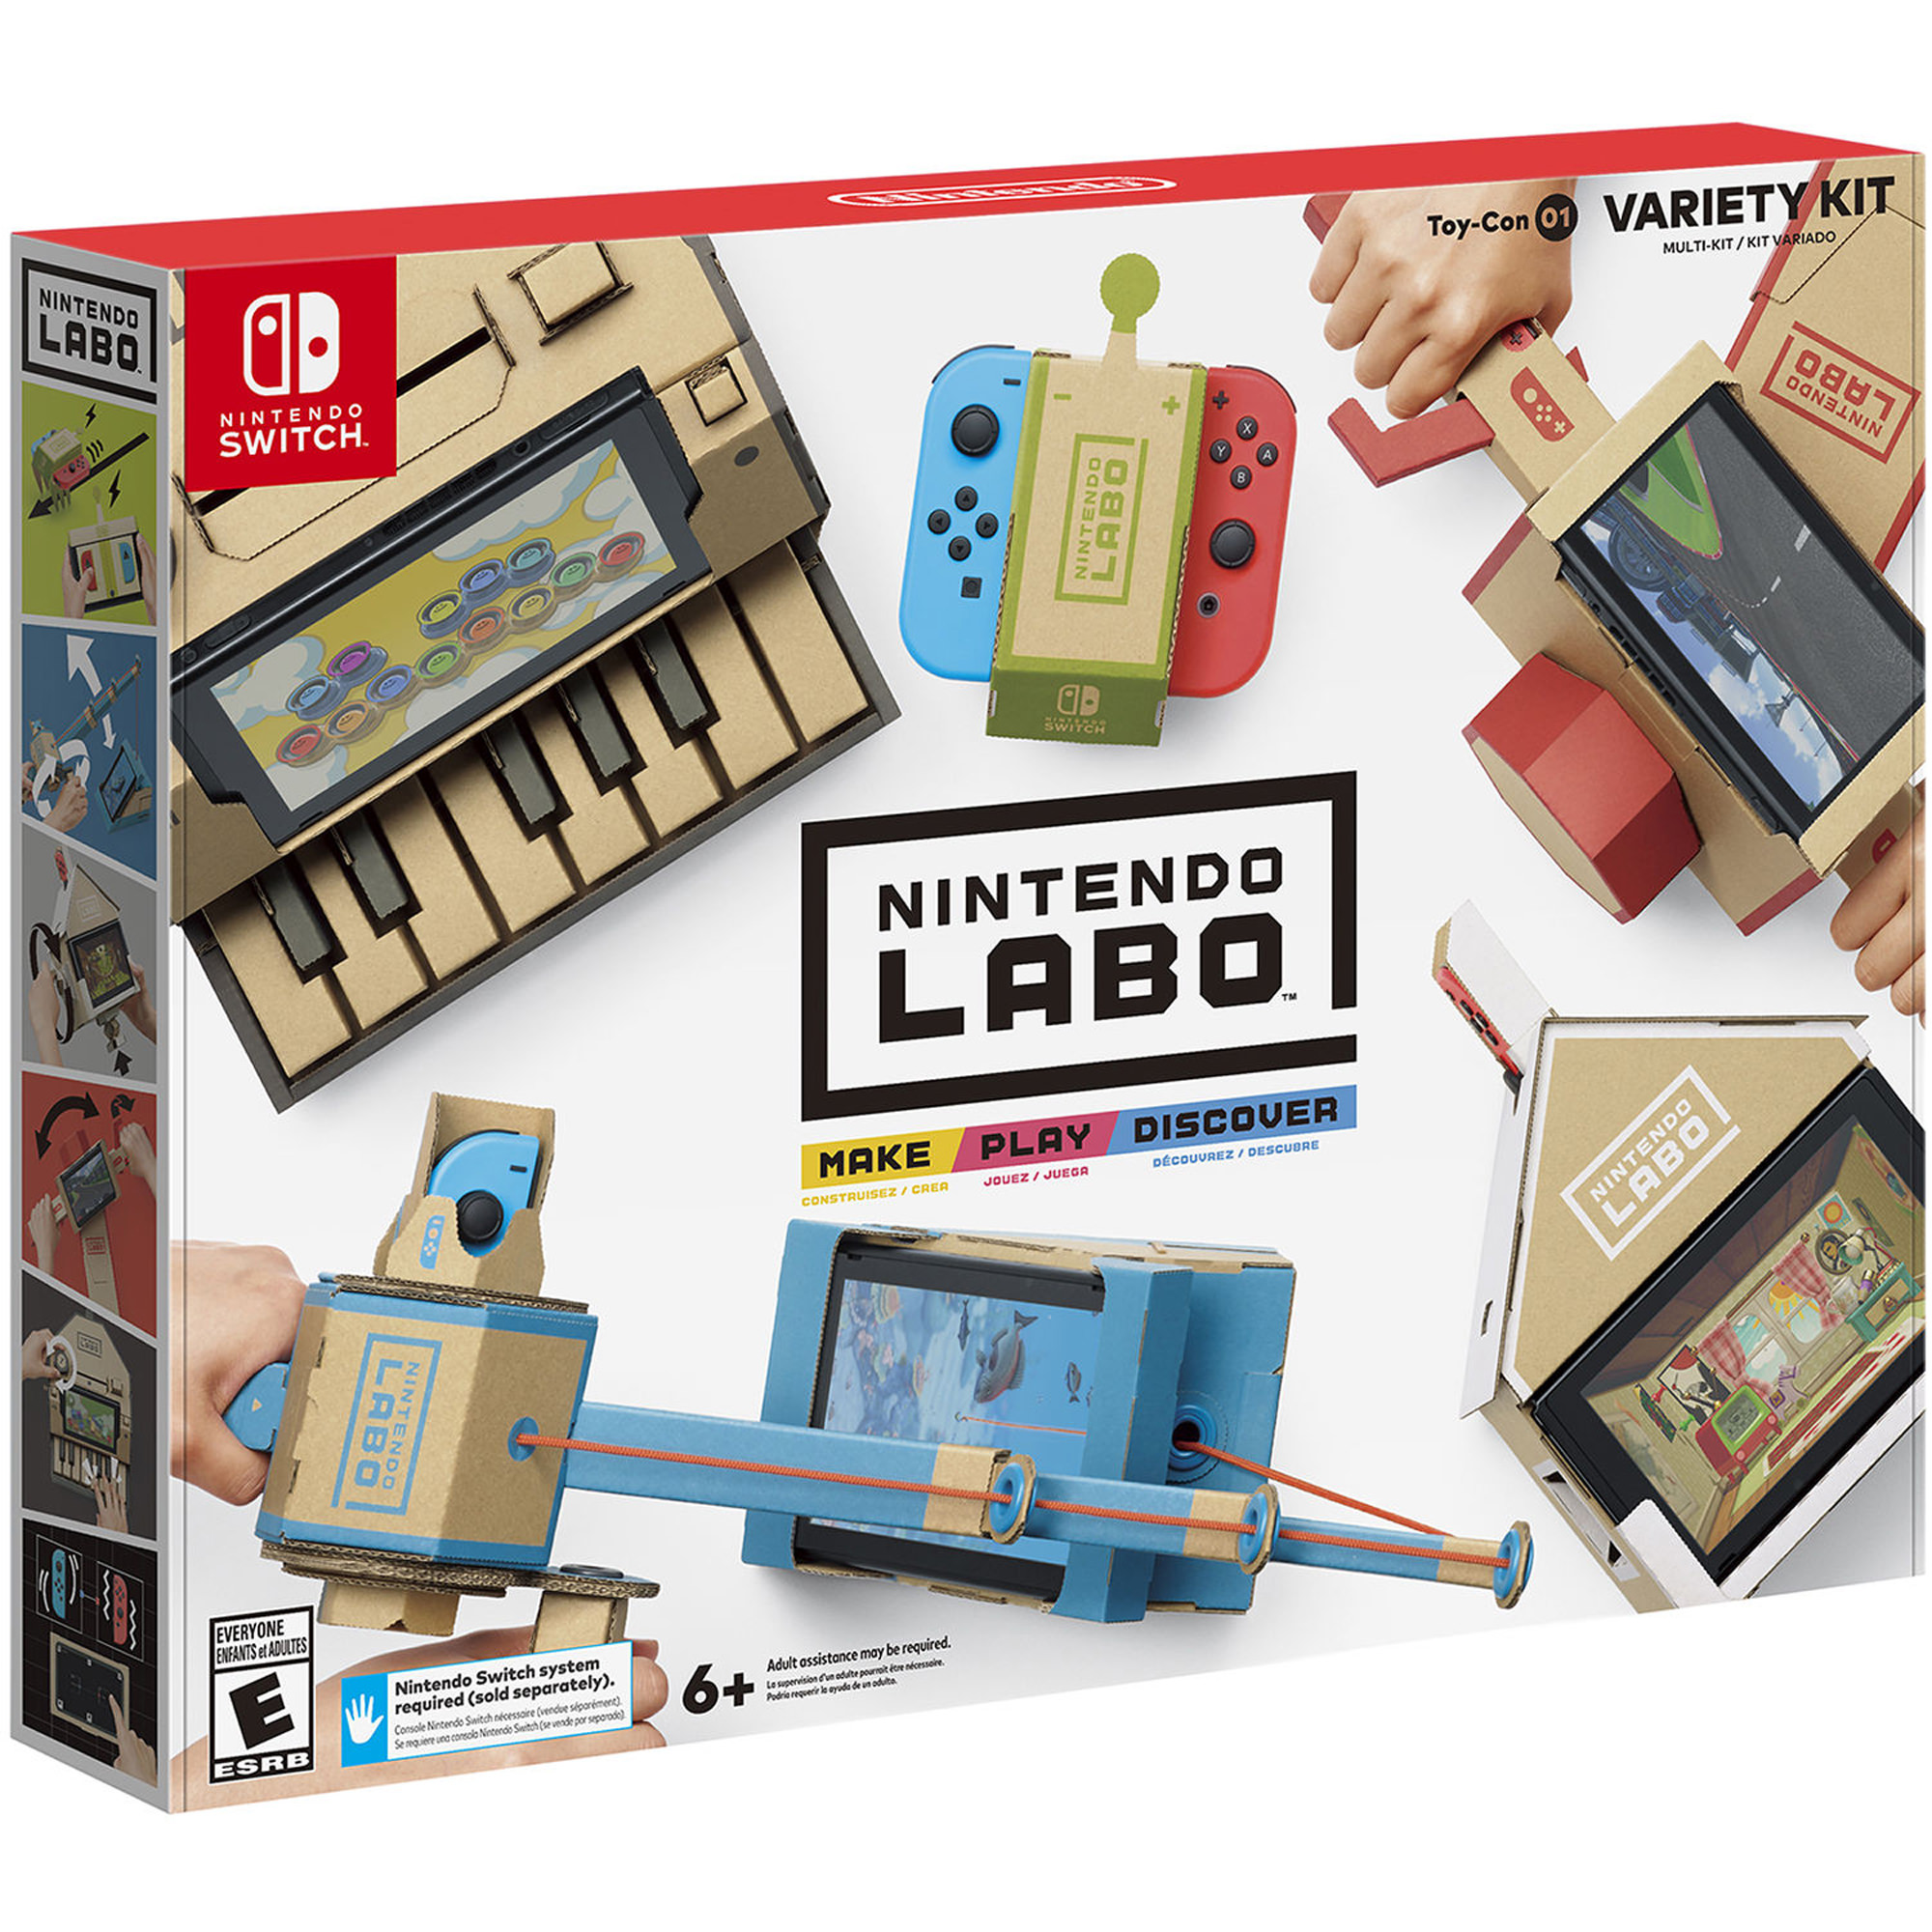 Nintendo Labo Variety Kit (Nintendo Switch), HACRADFUA